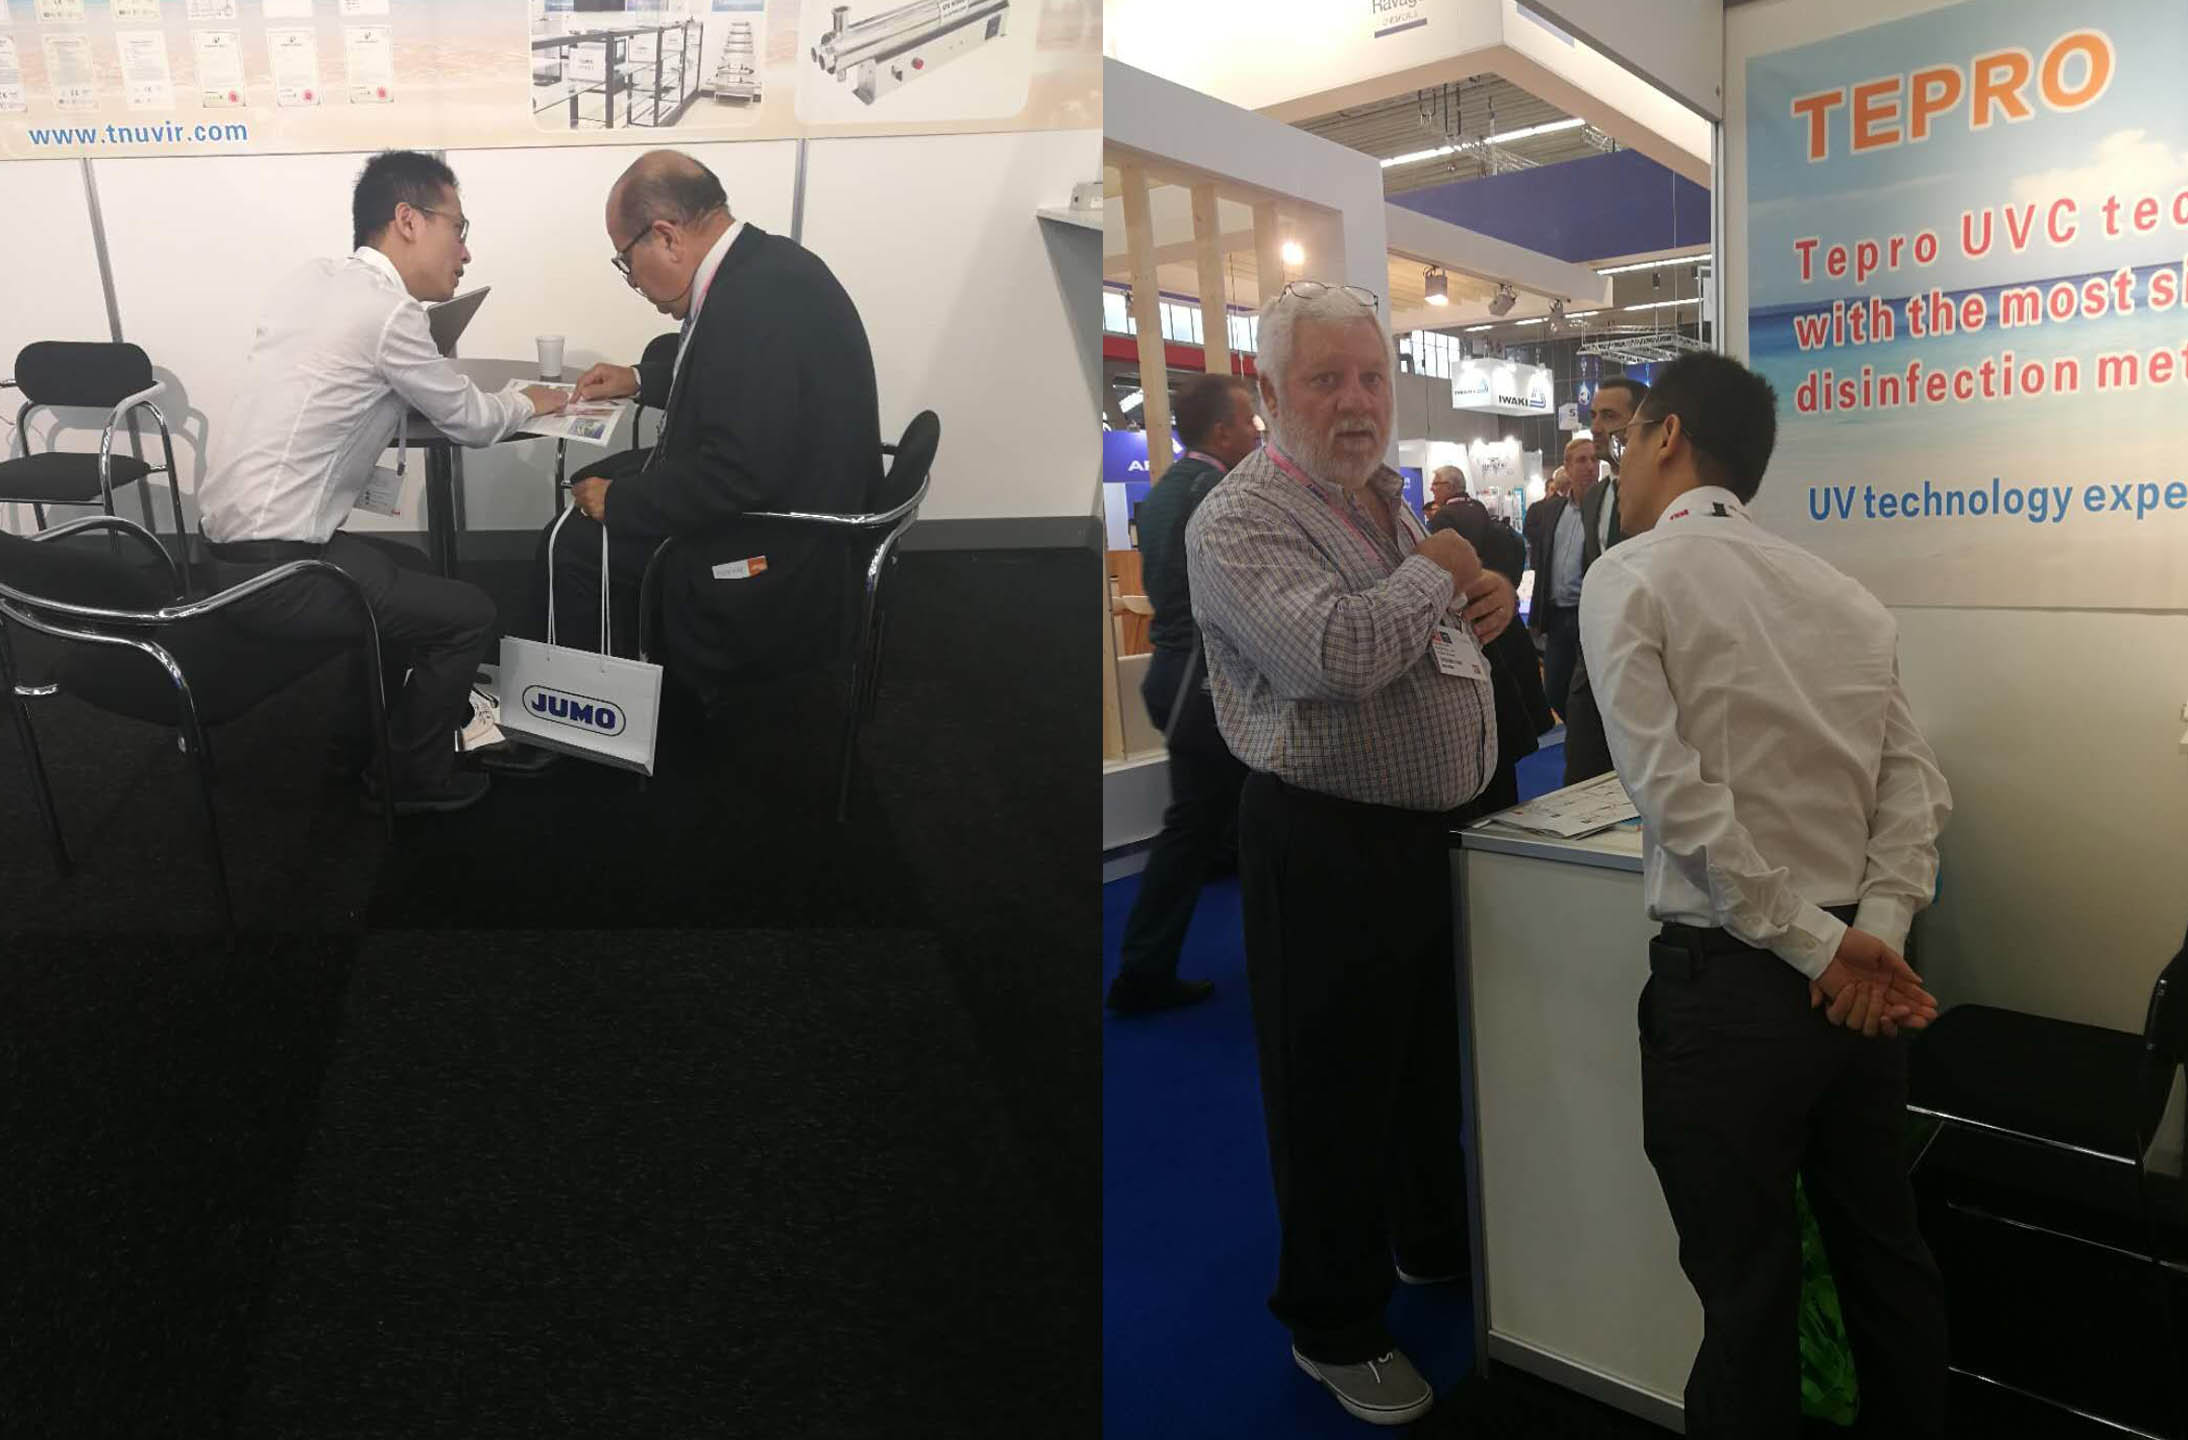 Tepro-Read Aquatech Amsterdam News On Tepro Uv Lamps-1